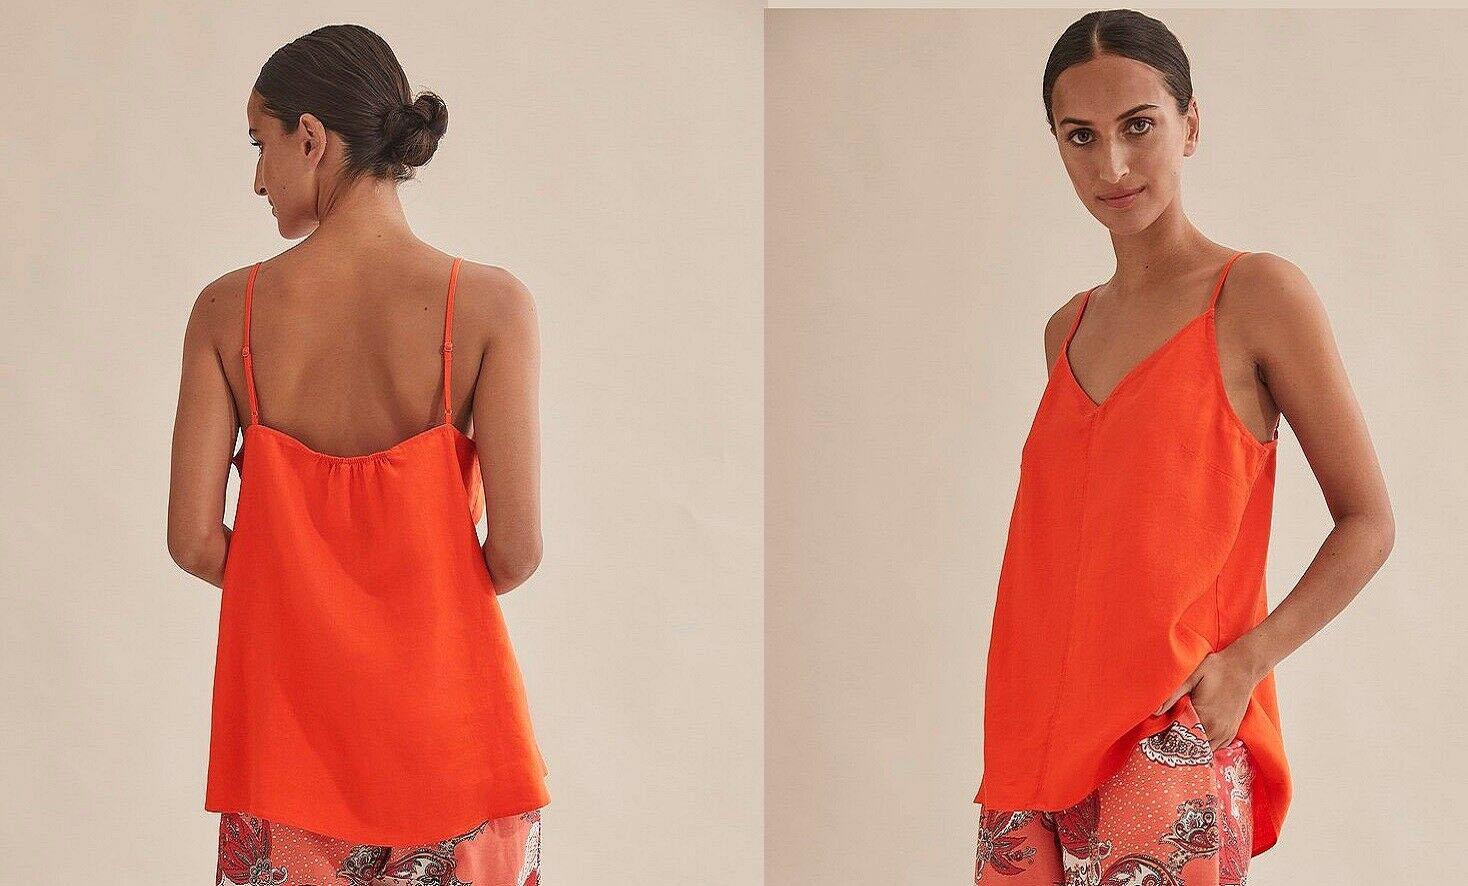 french fashion 100% pure cotton cami top4